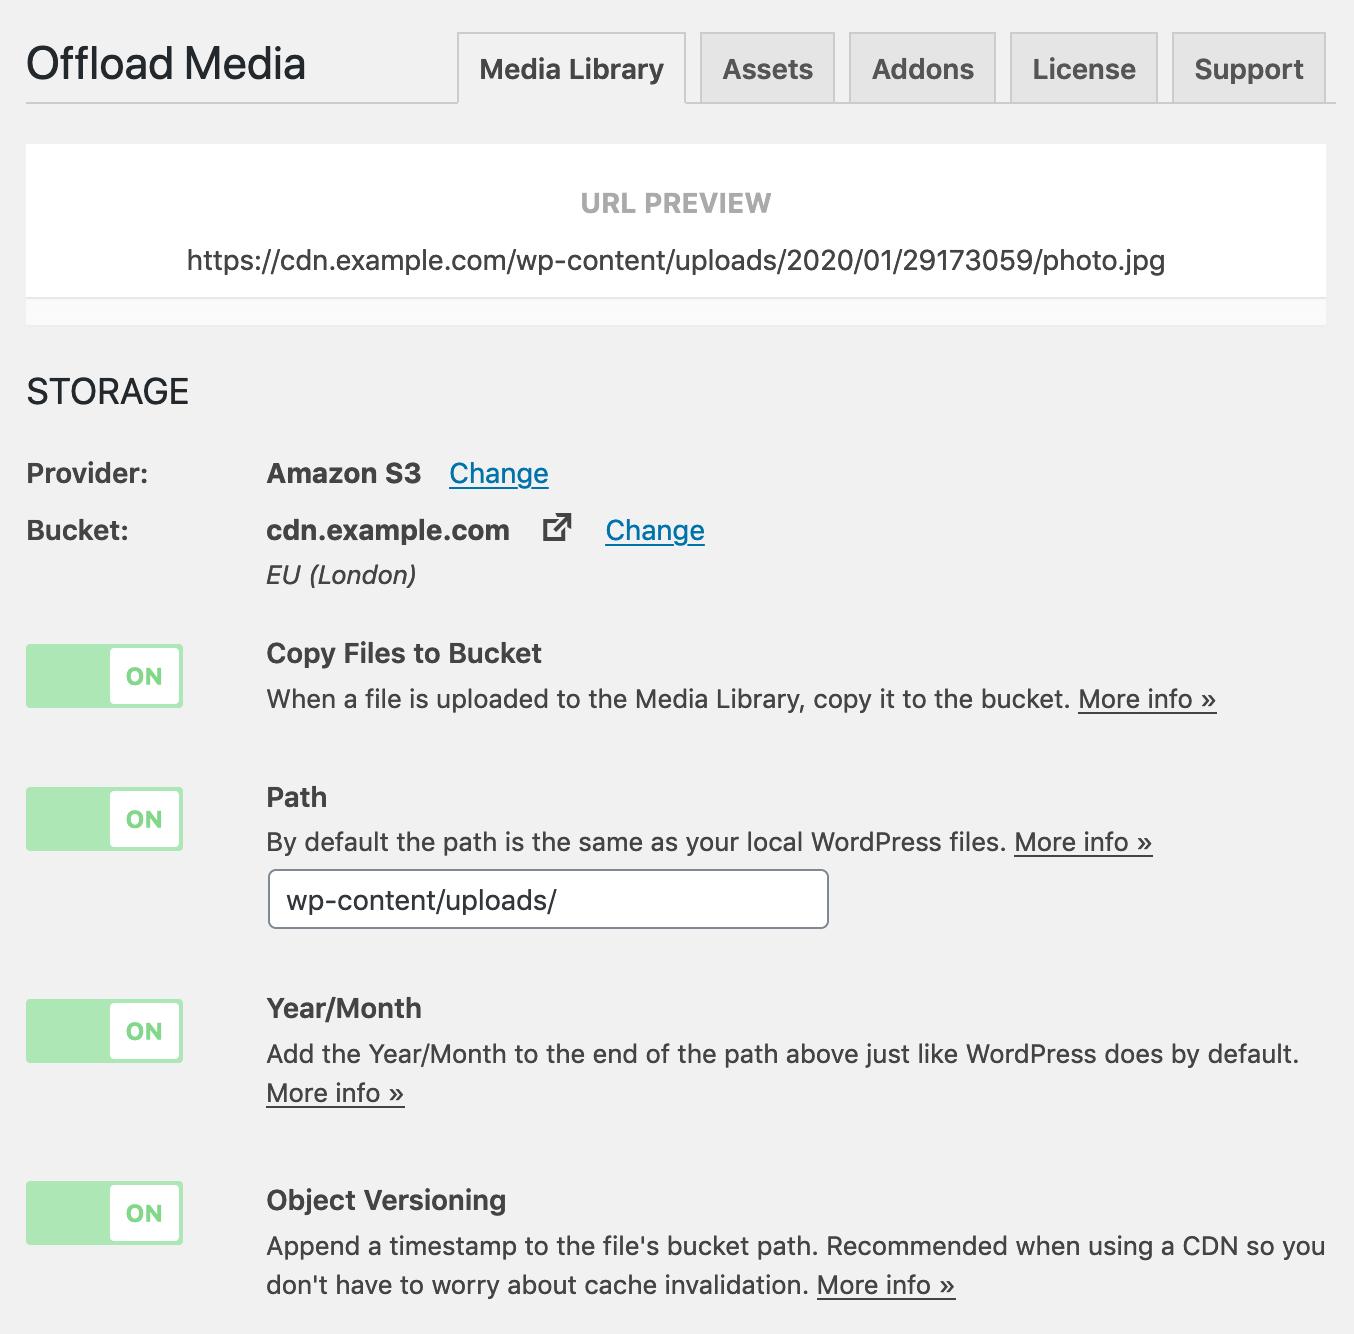 Offload Media Storage Settings